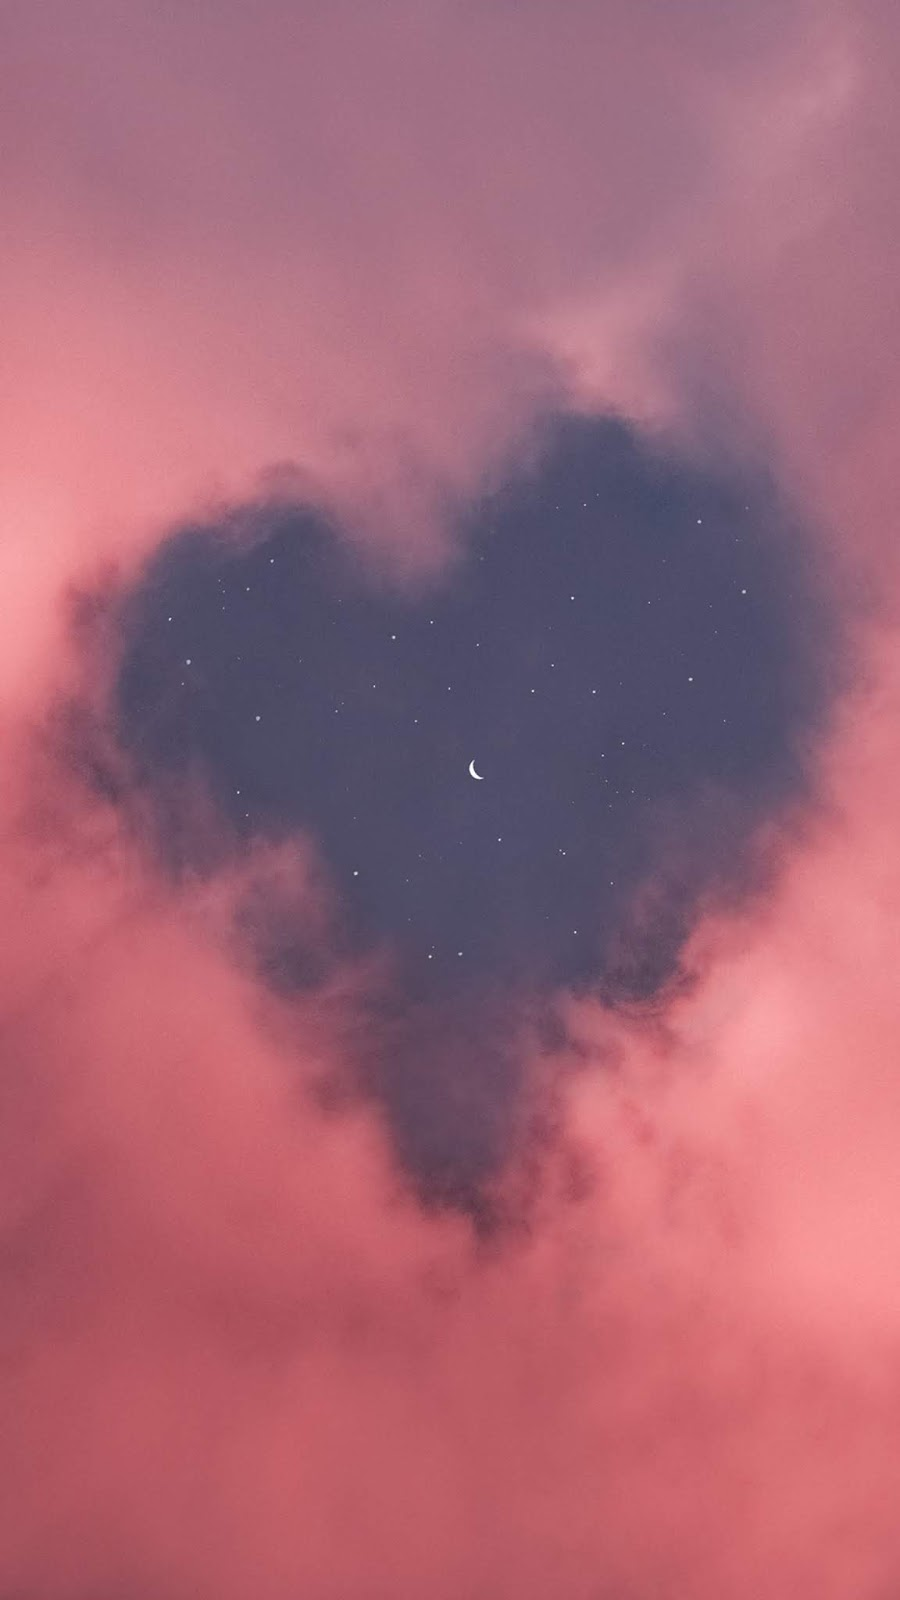 Moon heart wallpaper